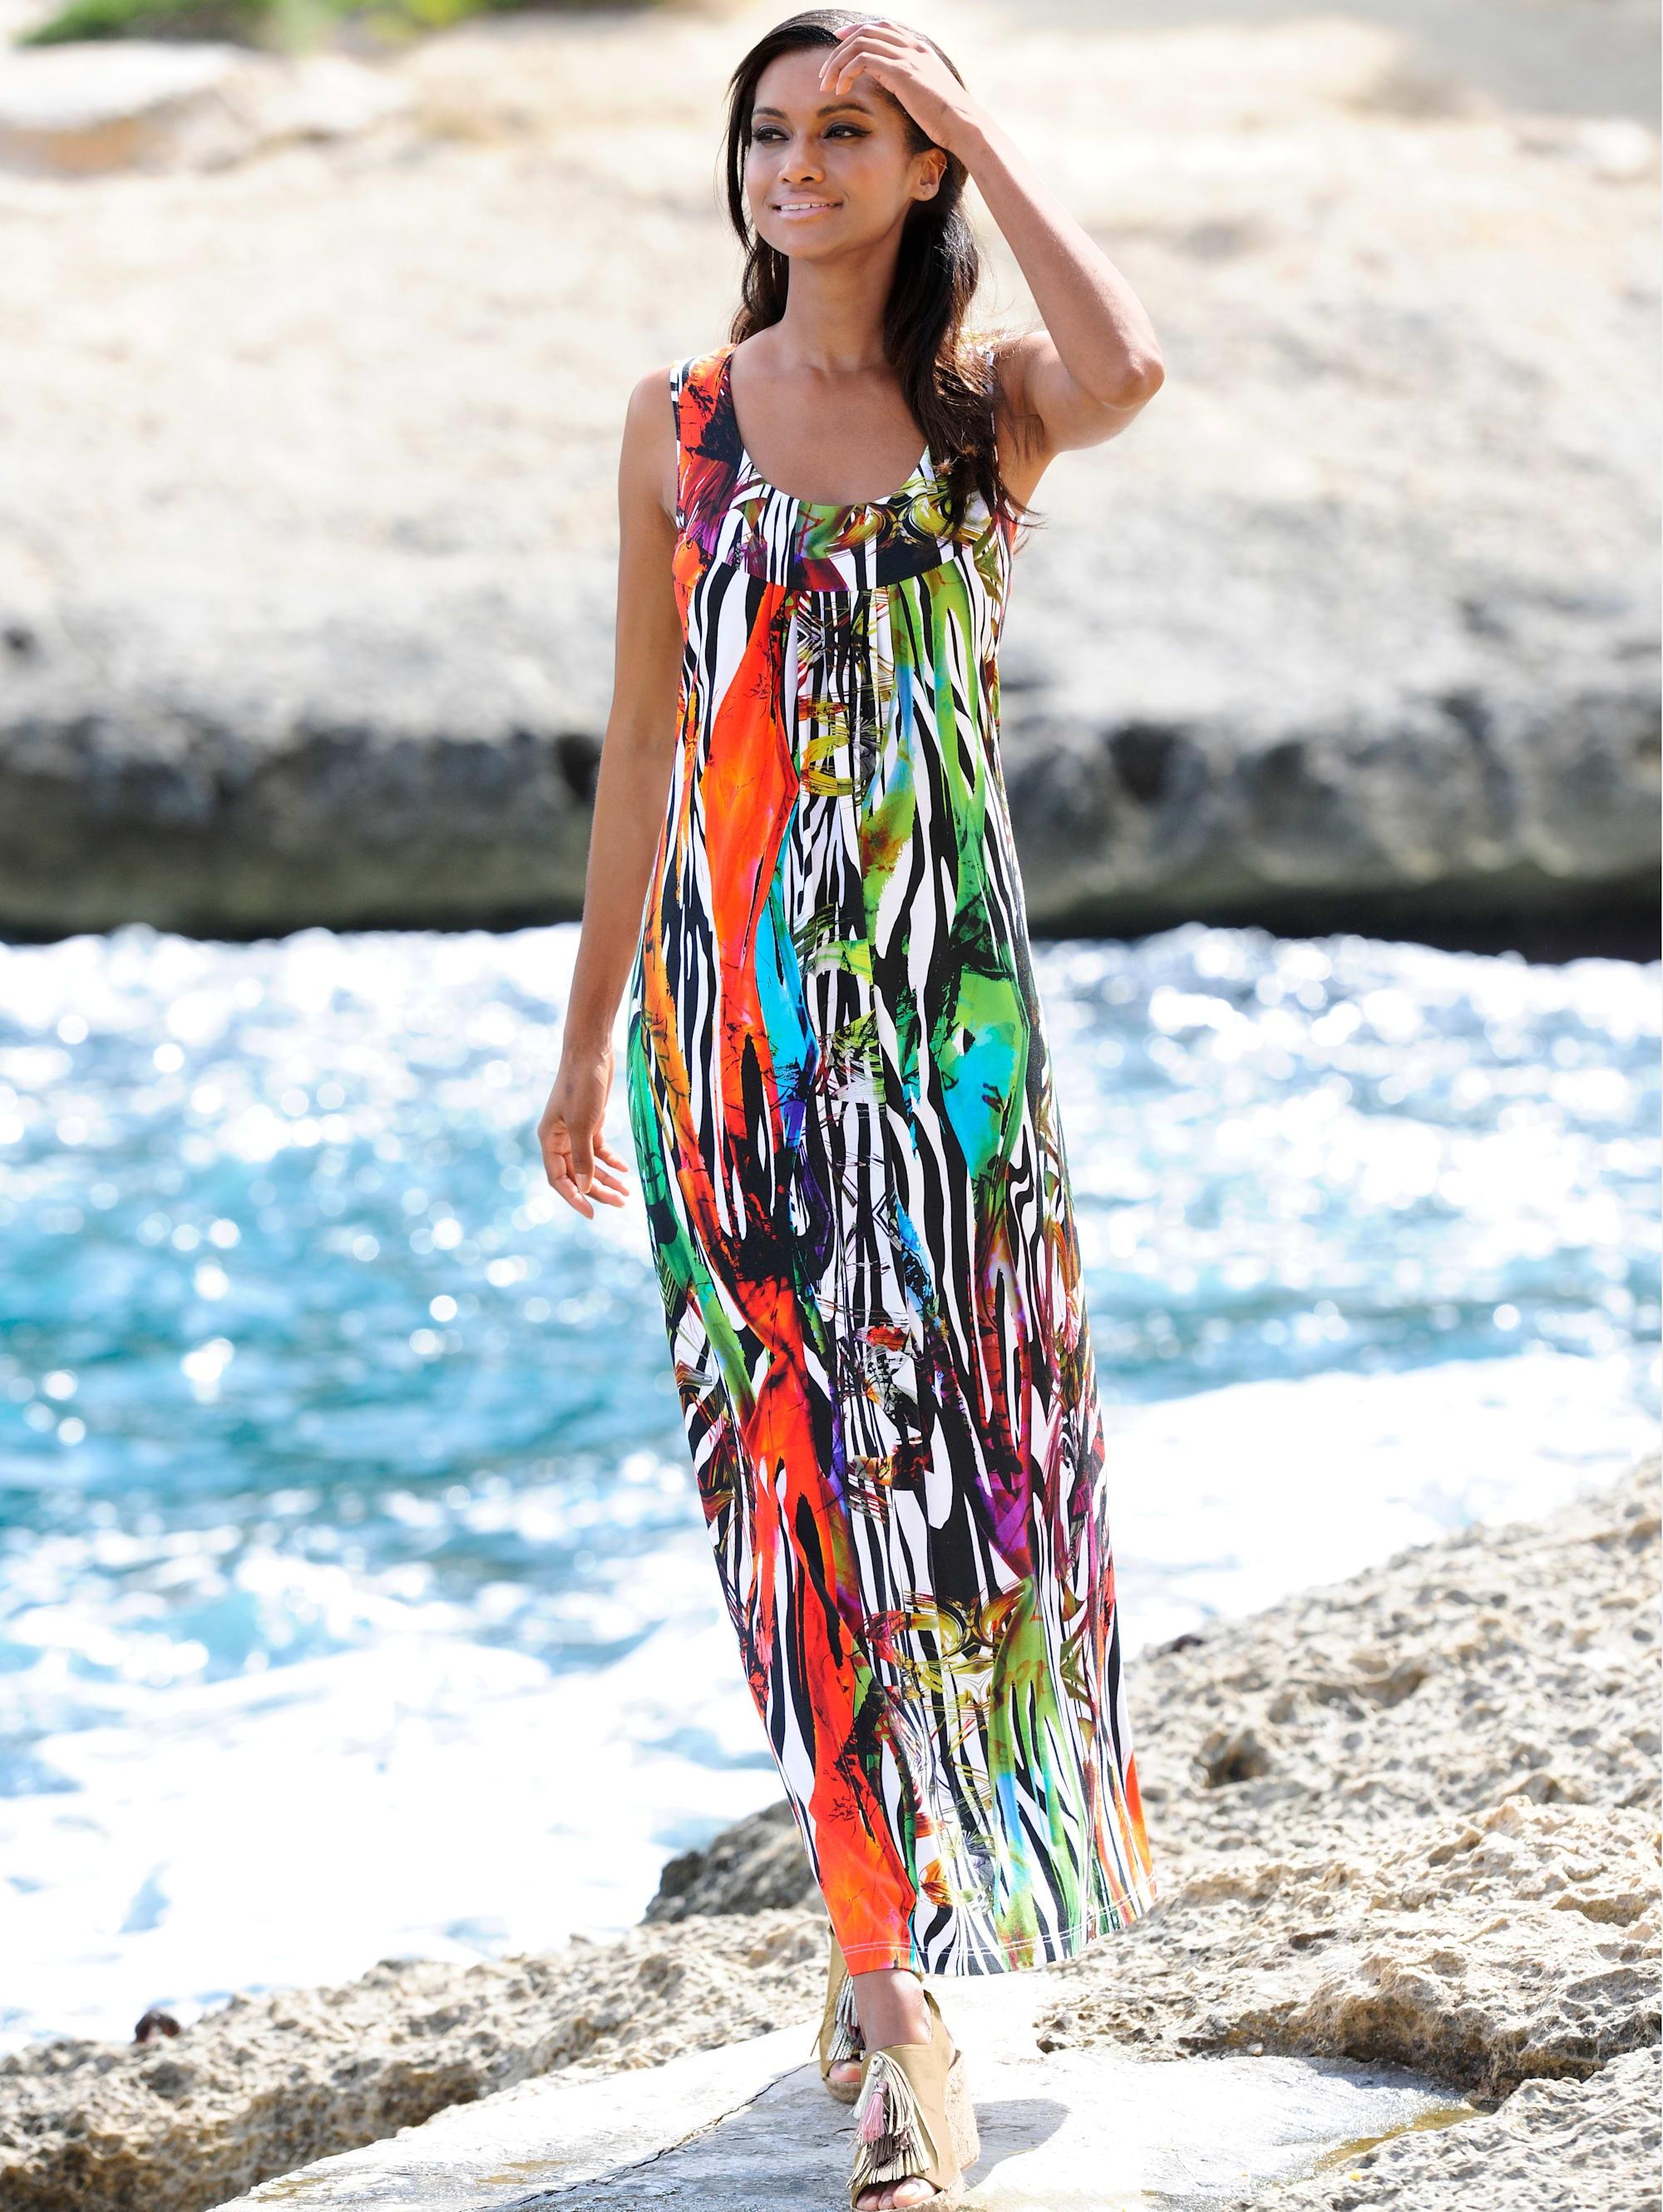 alba moda strandkleid mit großzügigem ausschnitt